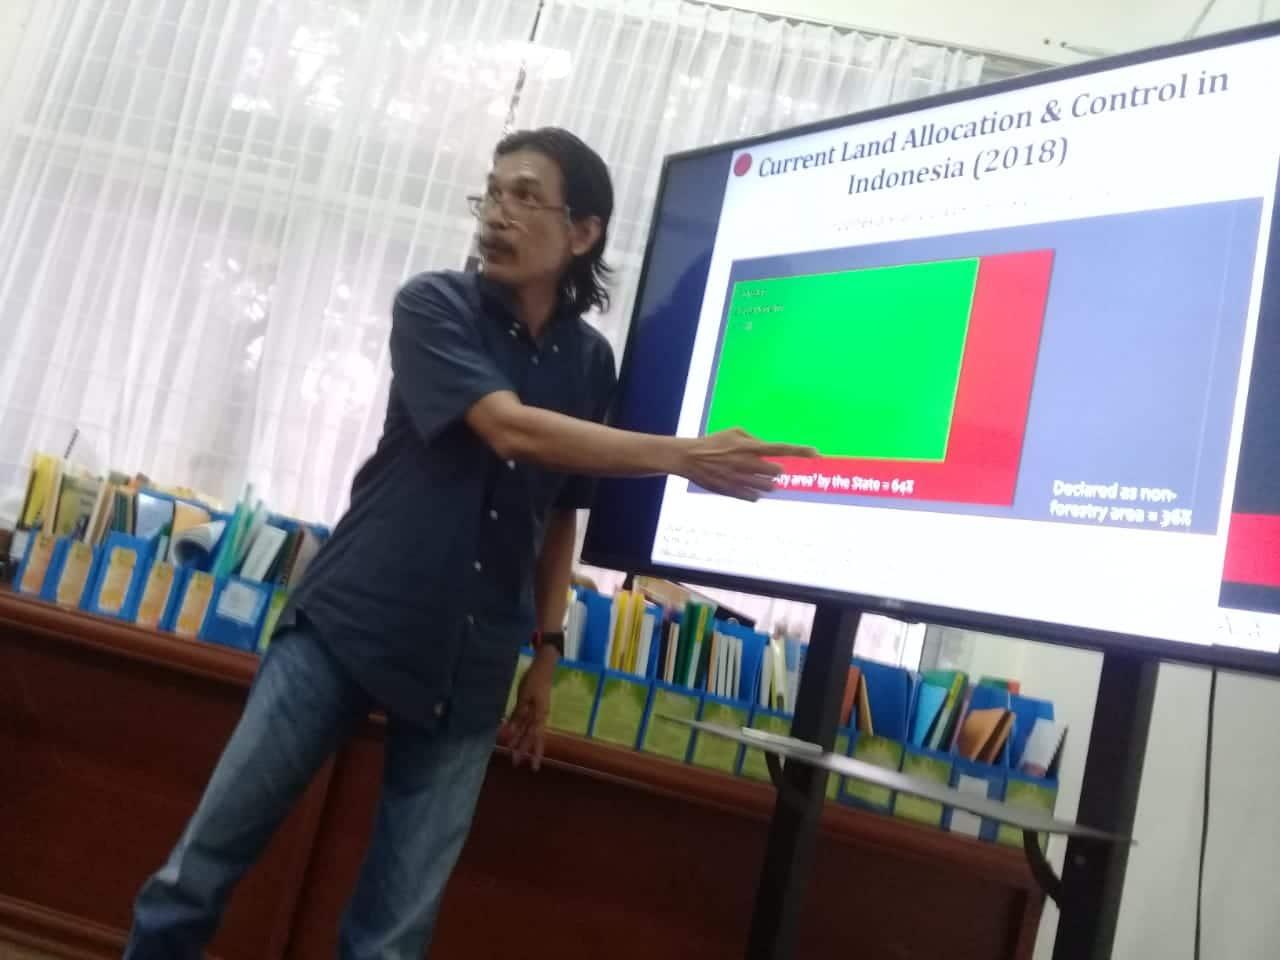 Dianto Bachriadi, Ph.D